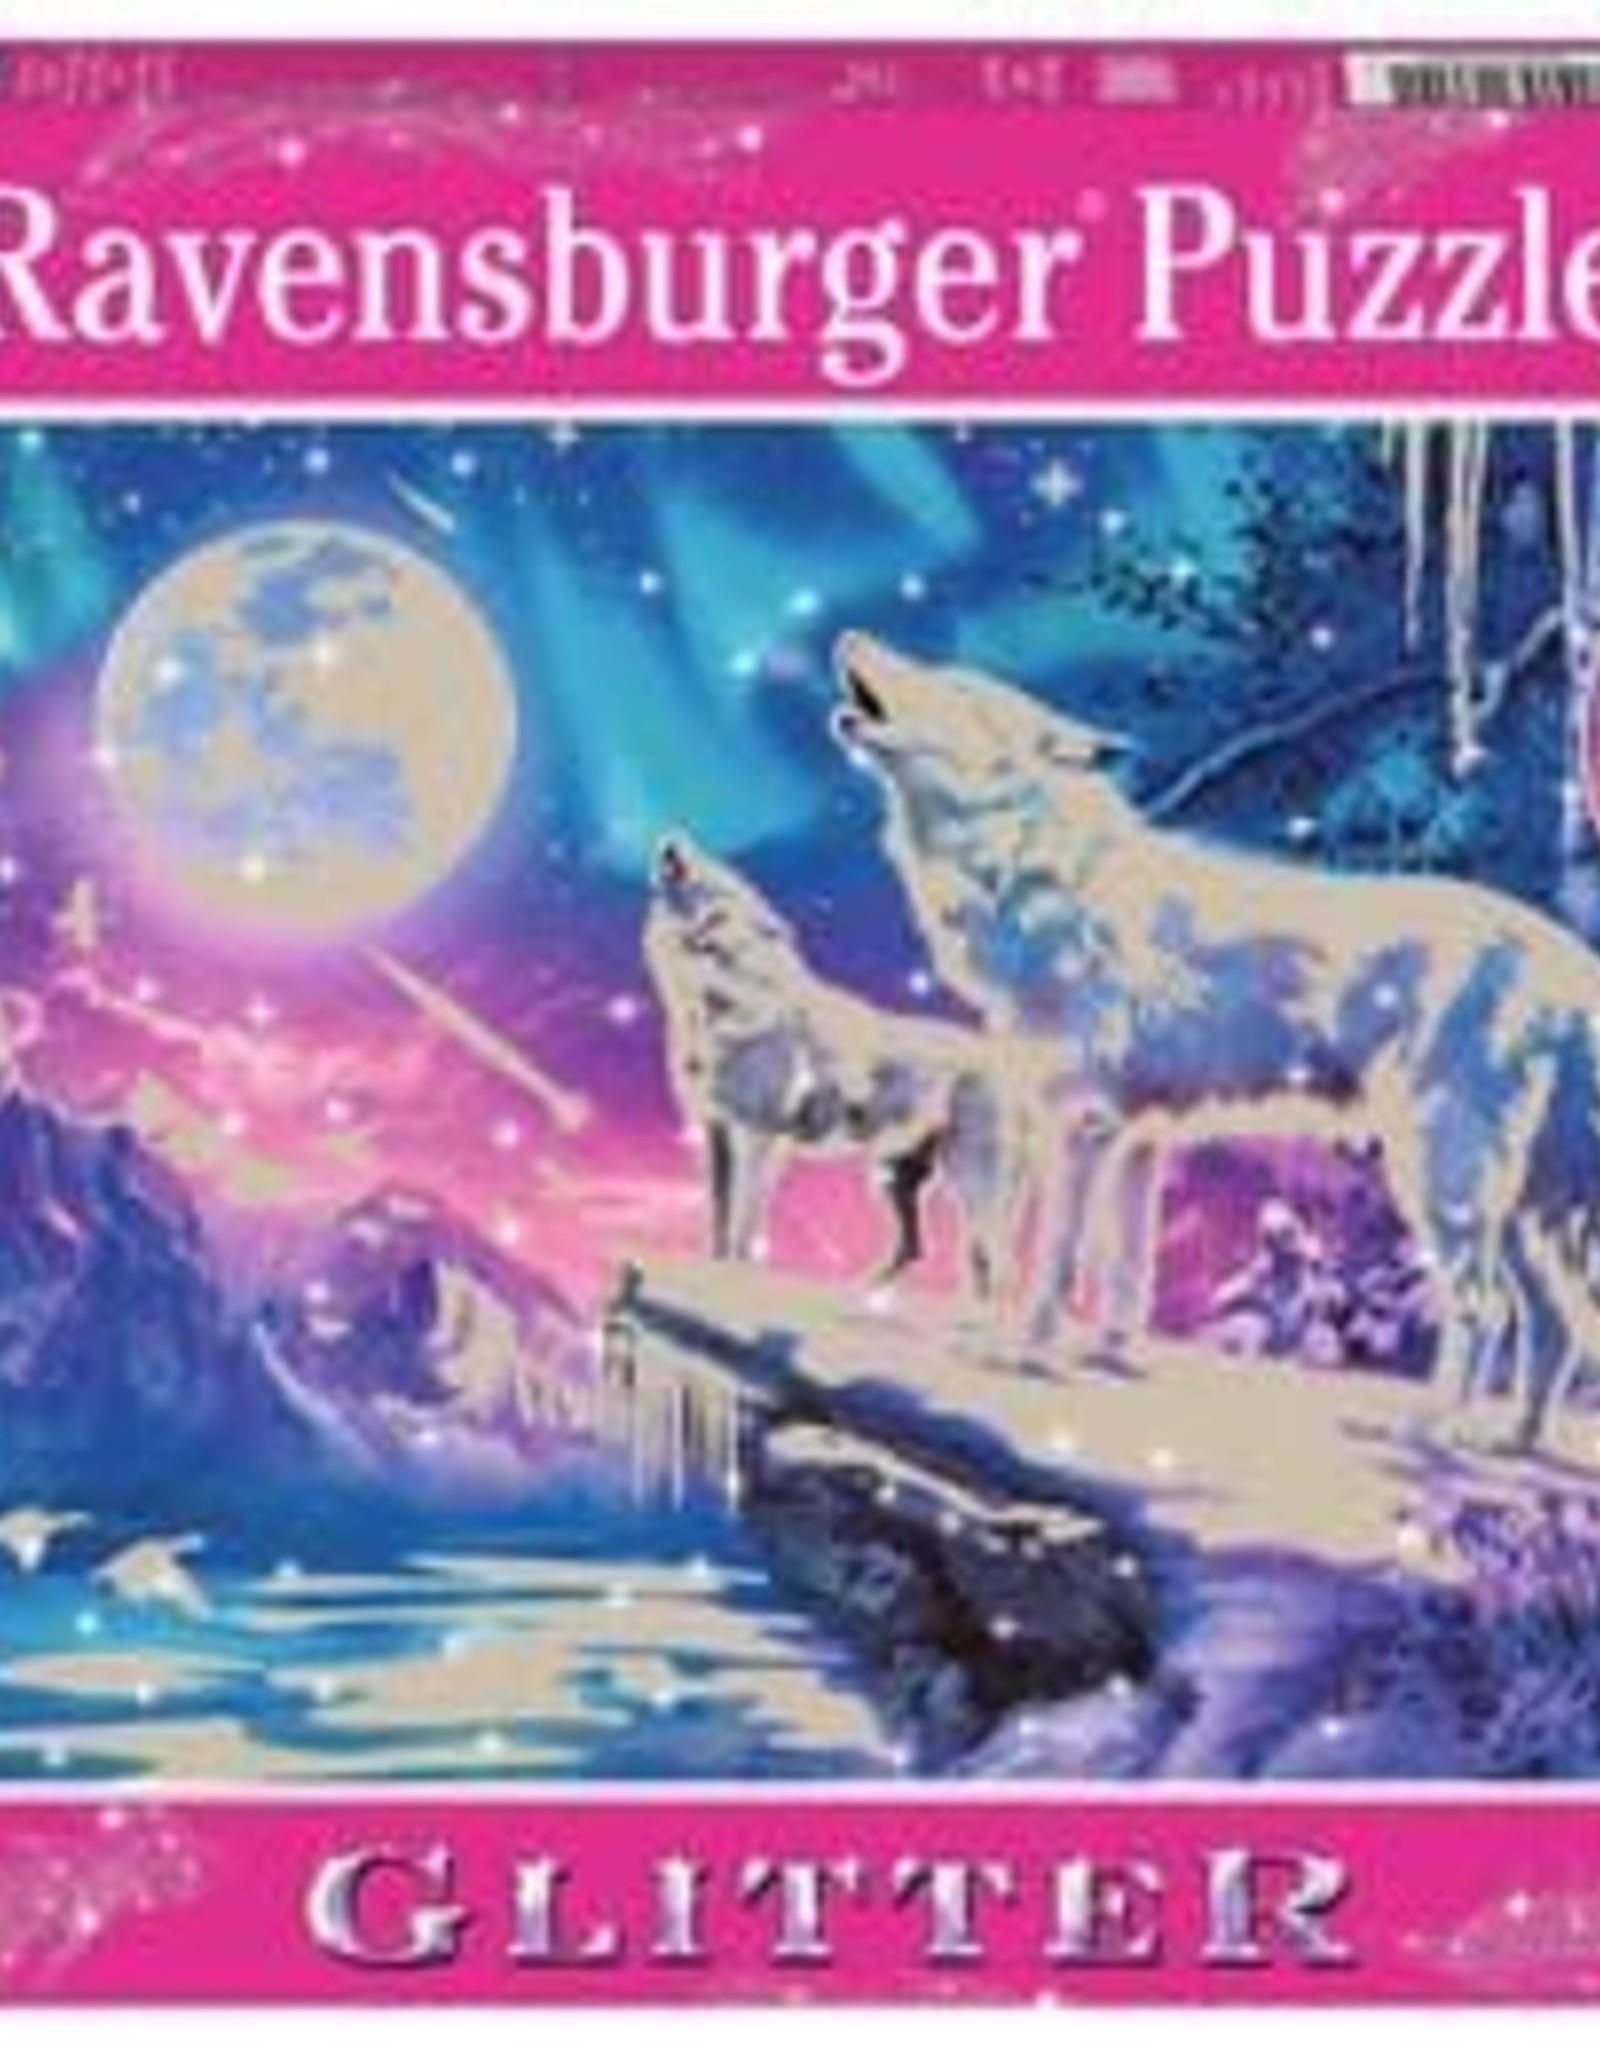 Ravensburger Twilight Howl 100pc Puzzle